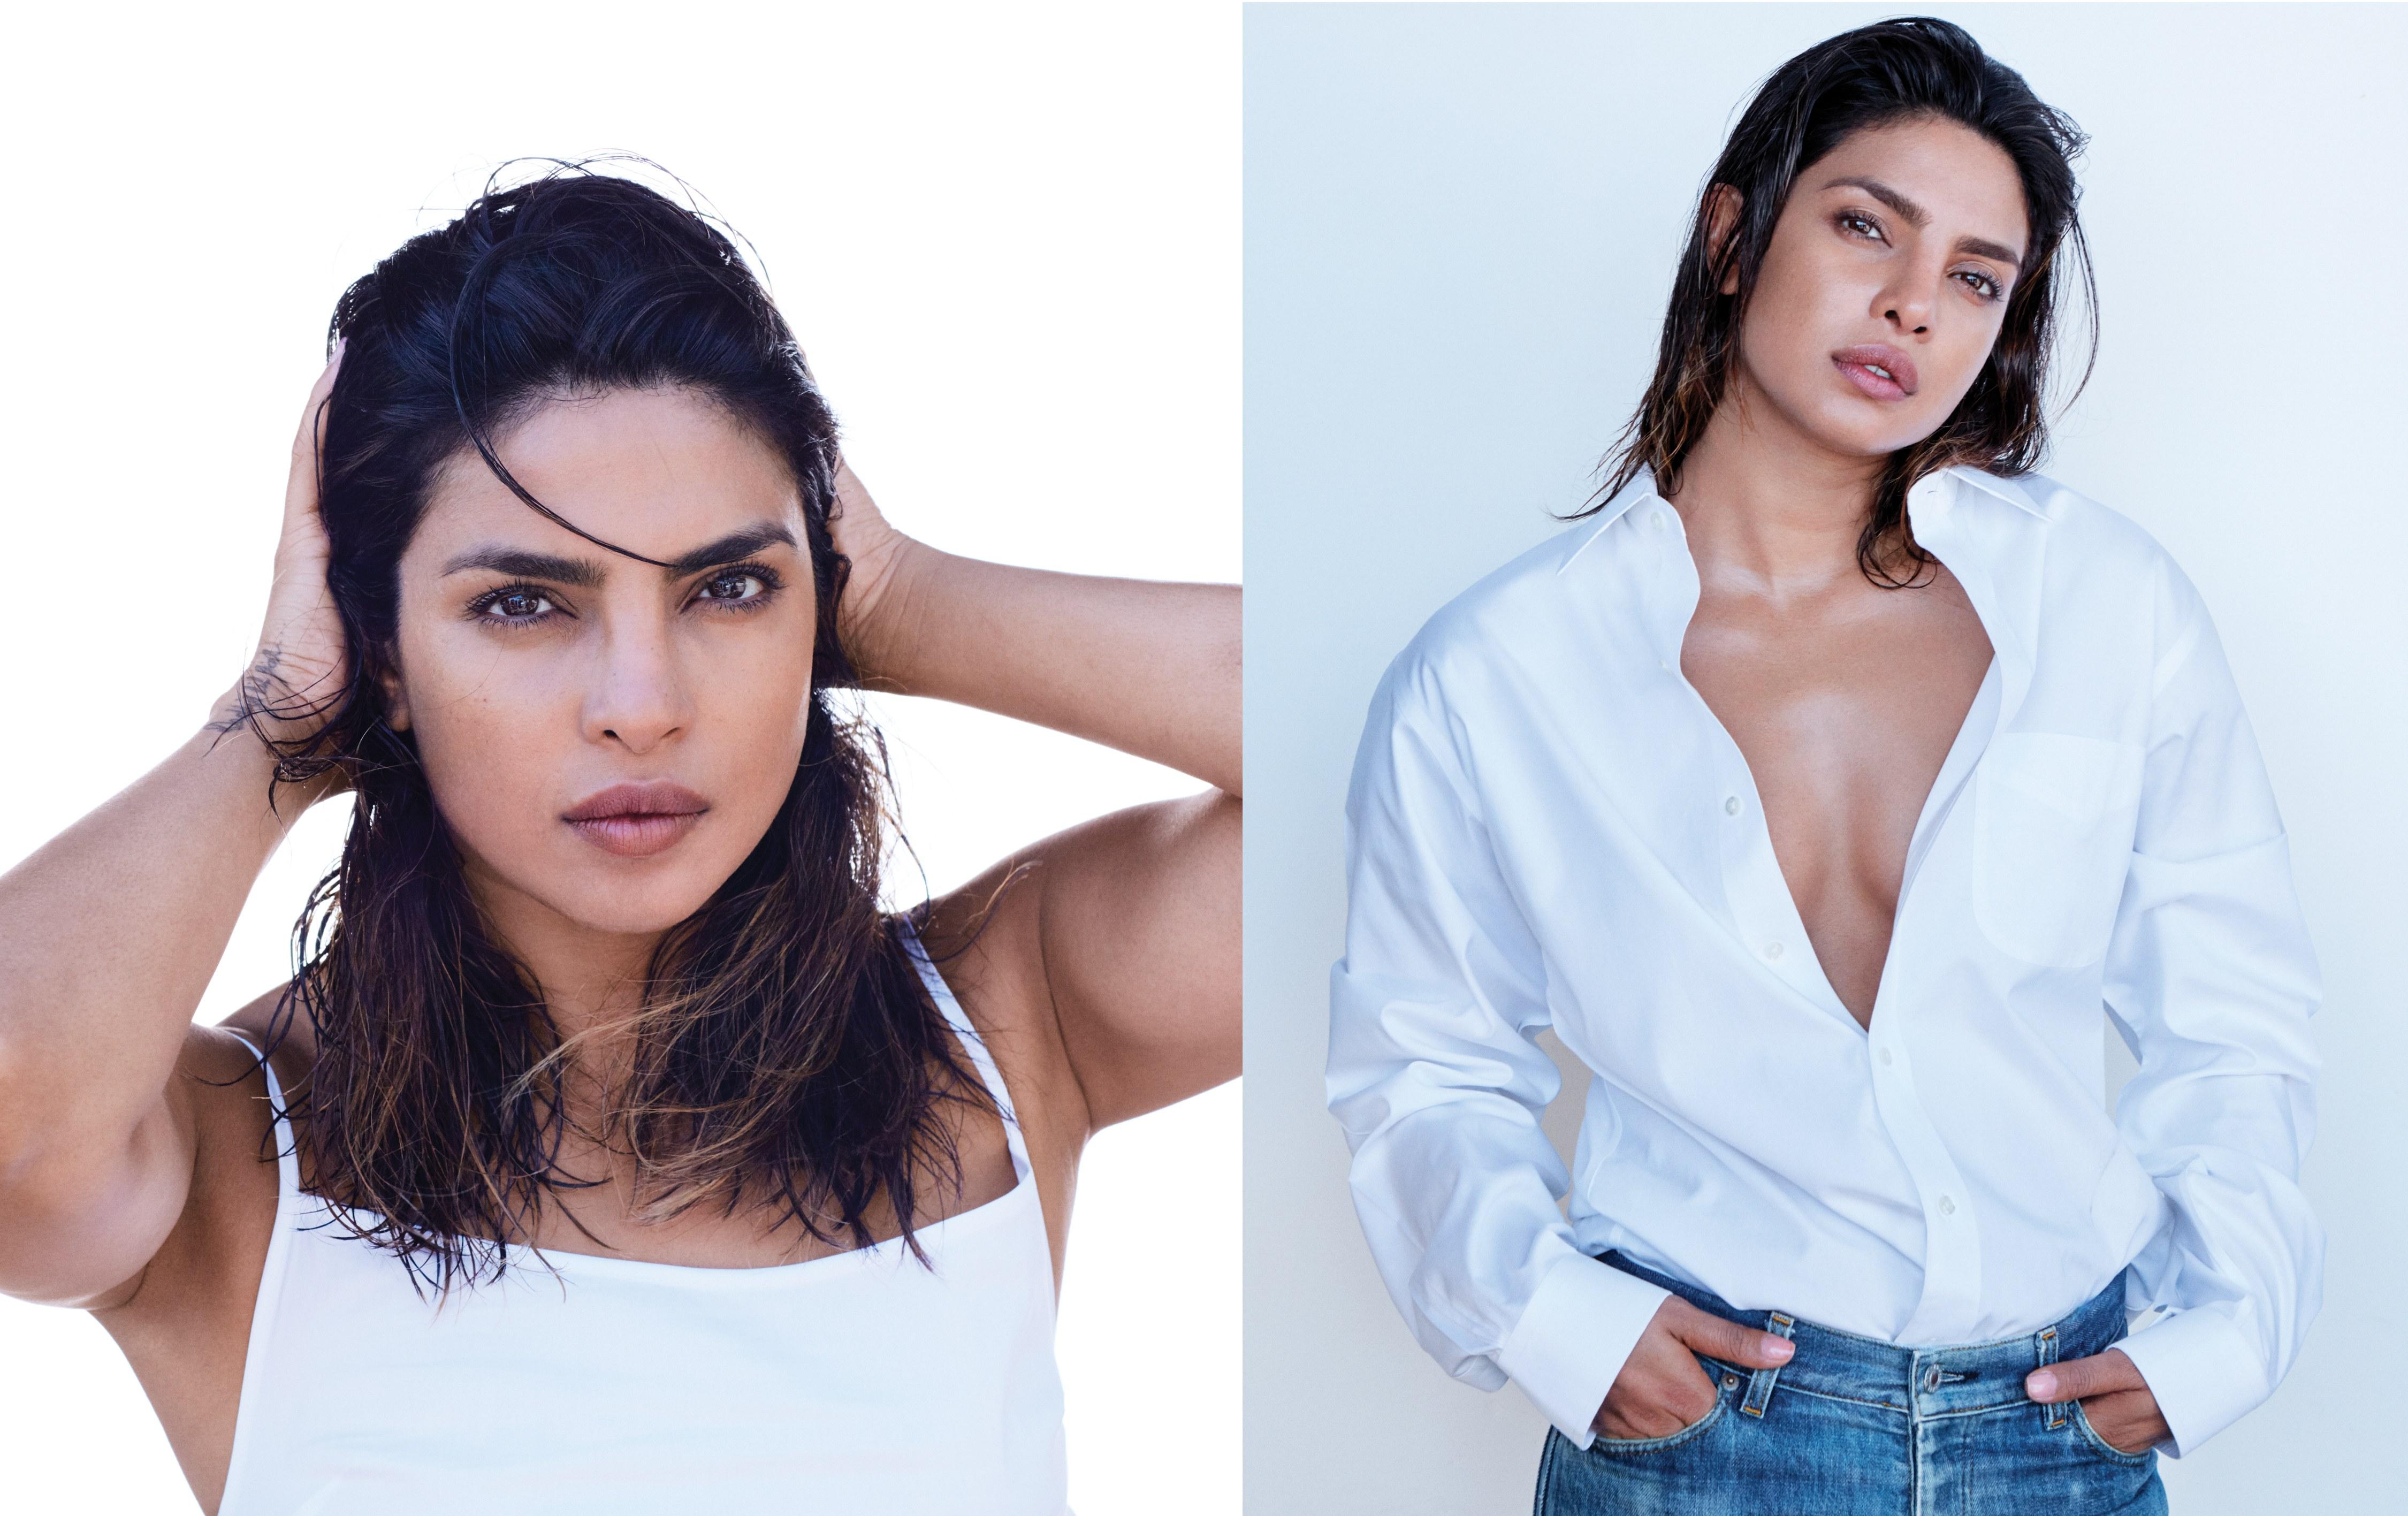 Priyanka Chopra on Rethinking How We See Beauty Allure Digital 4500x2833